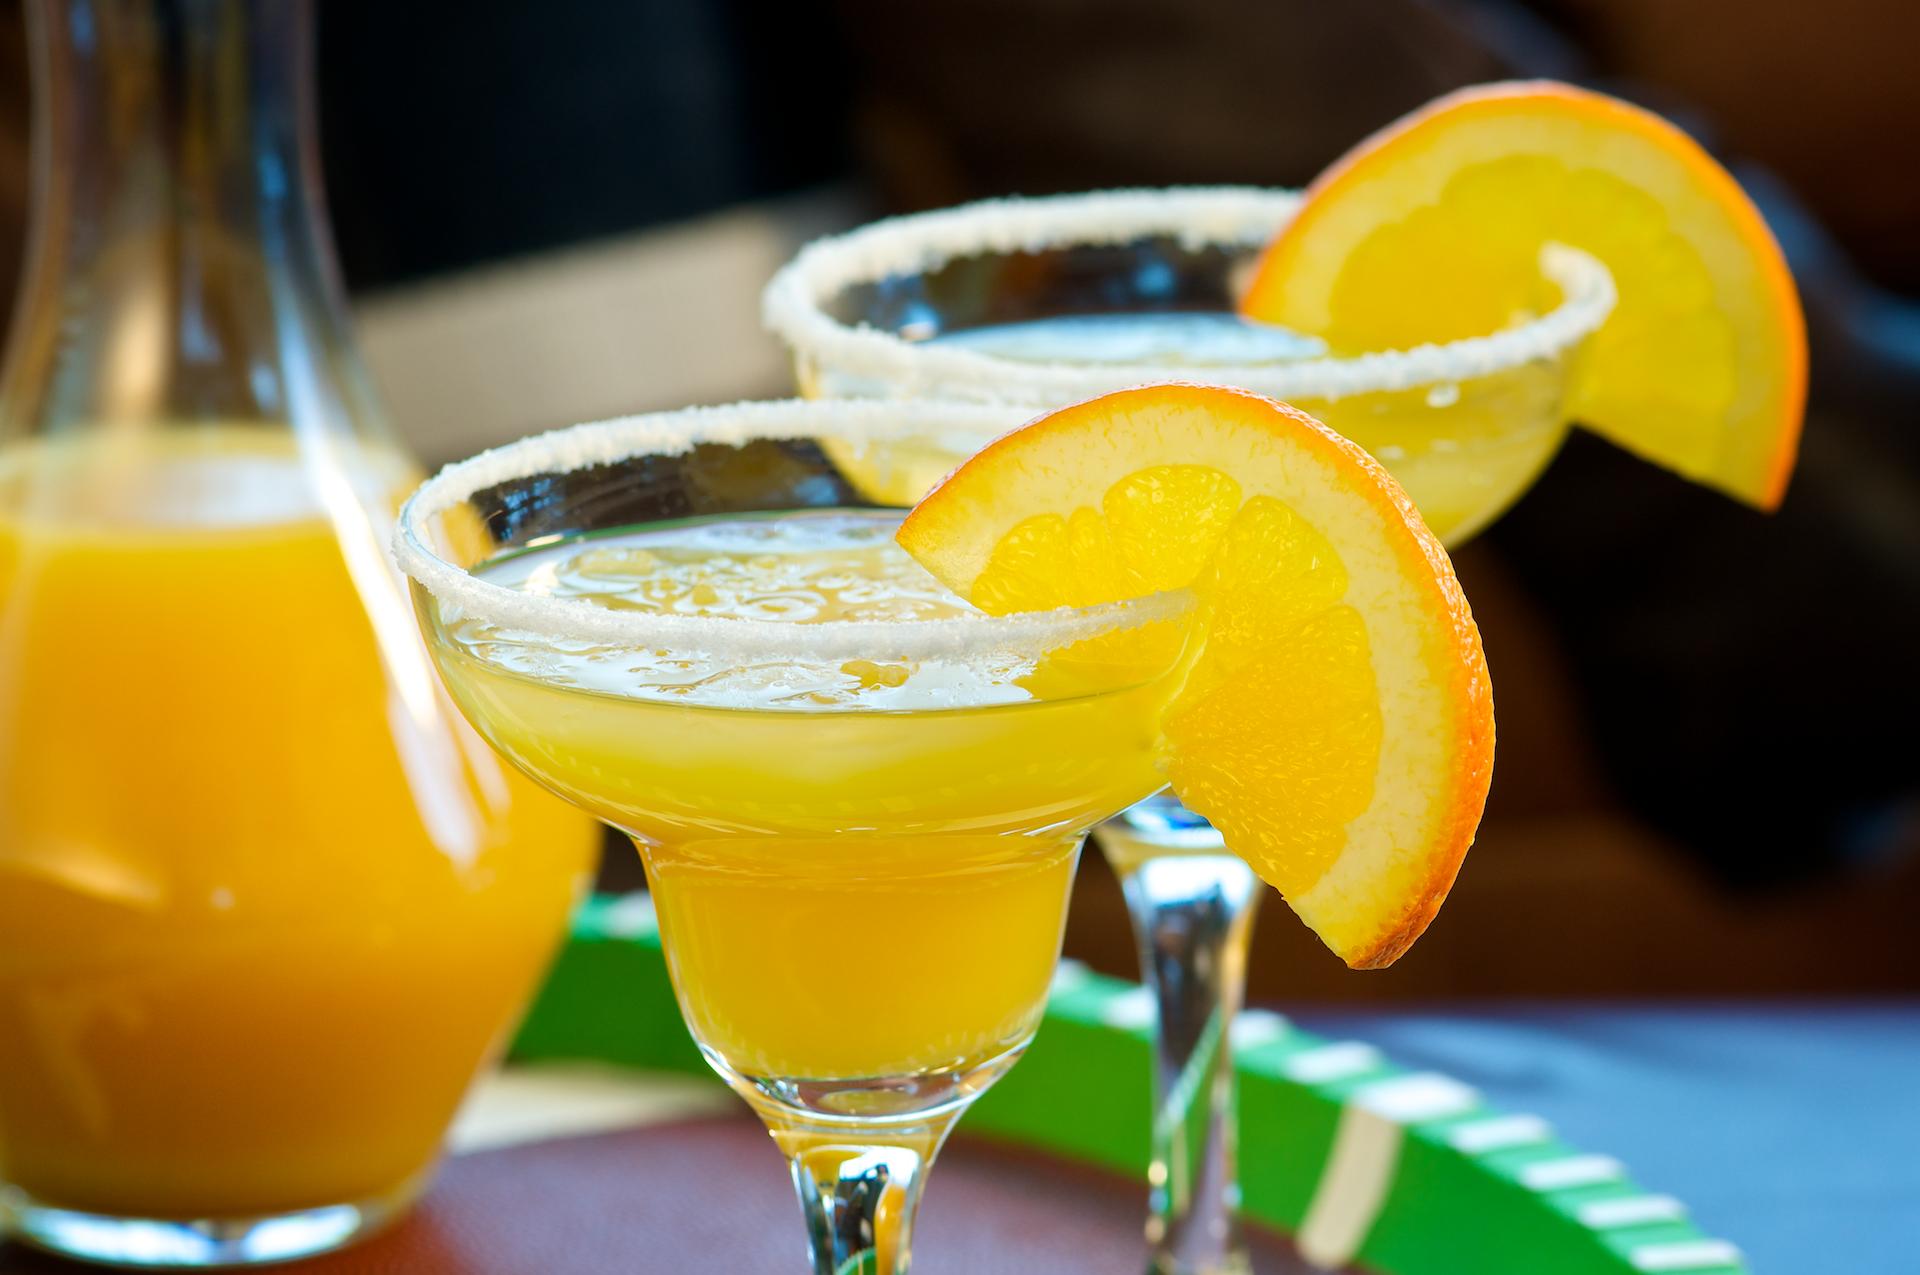 Margarita recipe for a crowd